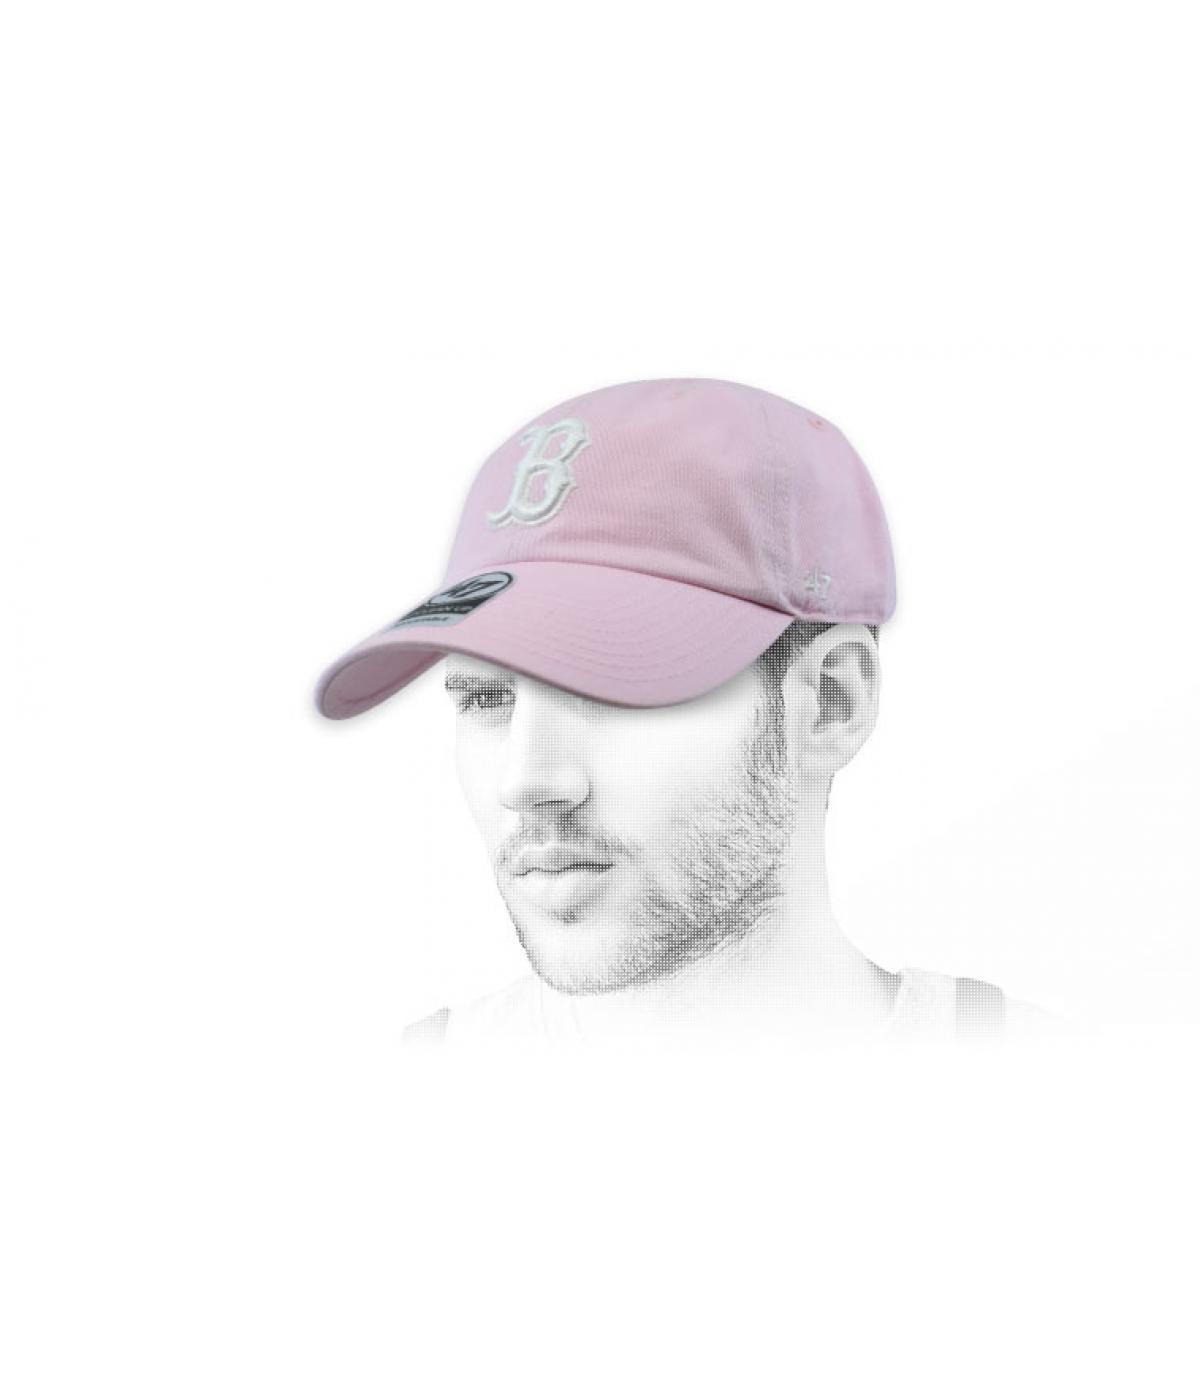 pale pink B cap